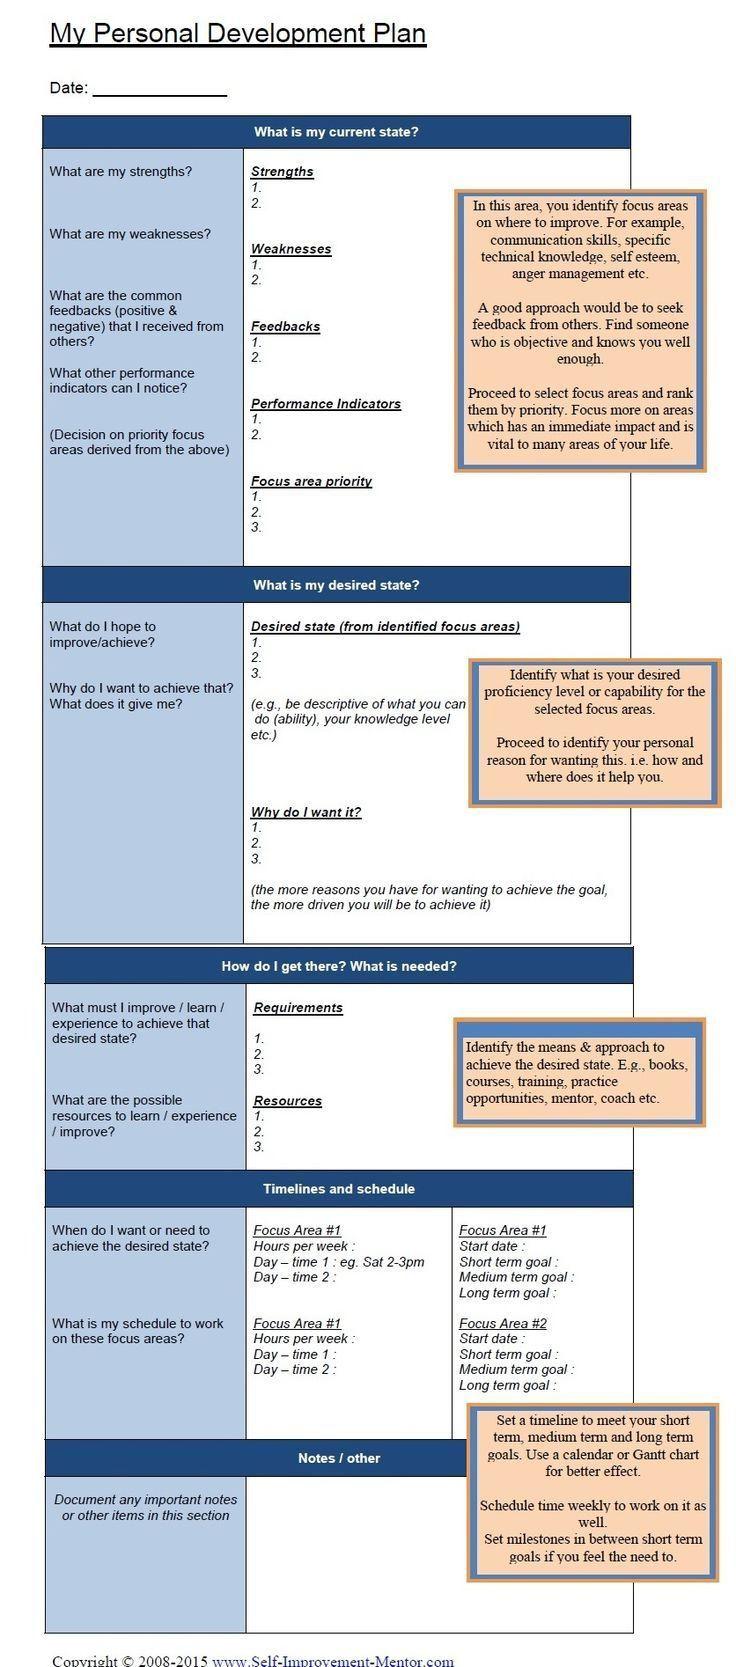 002 Rare Personal Development Plan Example Professional Doc Image Full